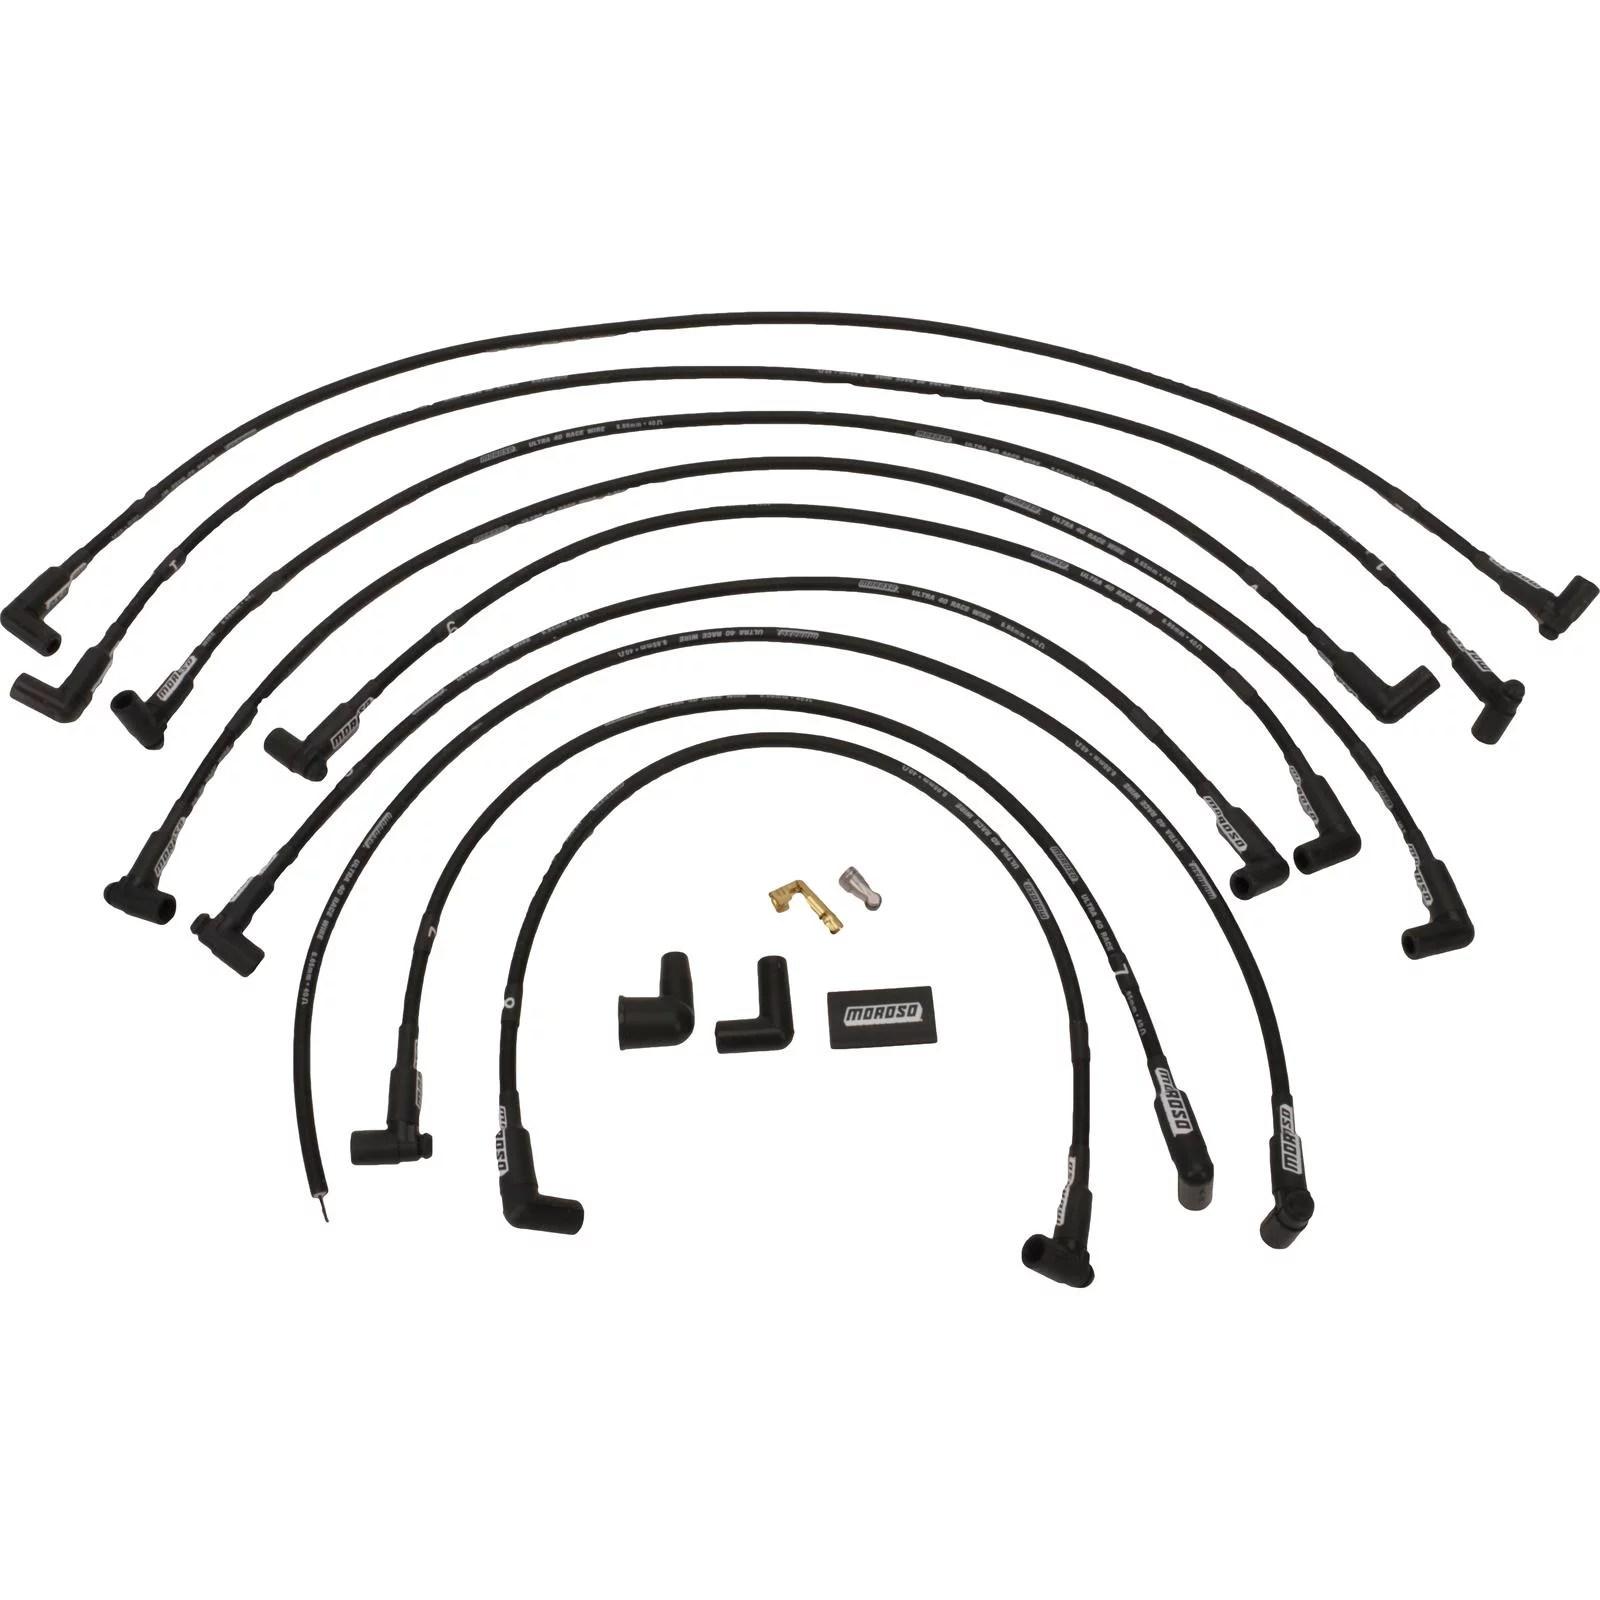 Moroso Small Block Chevy Custom Wires 90 Degree